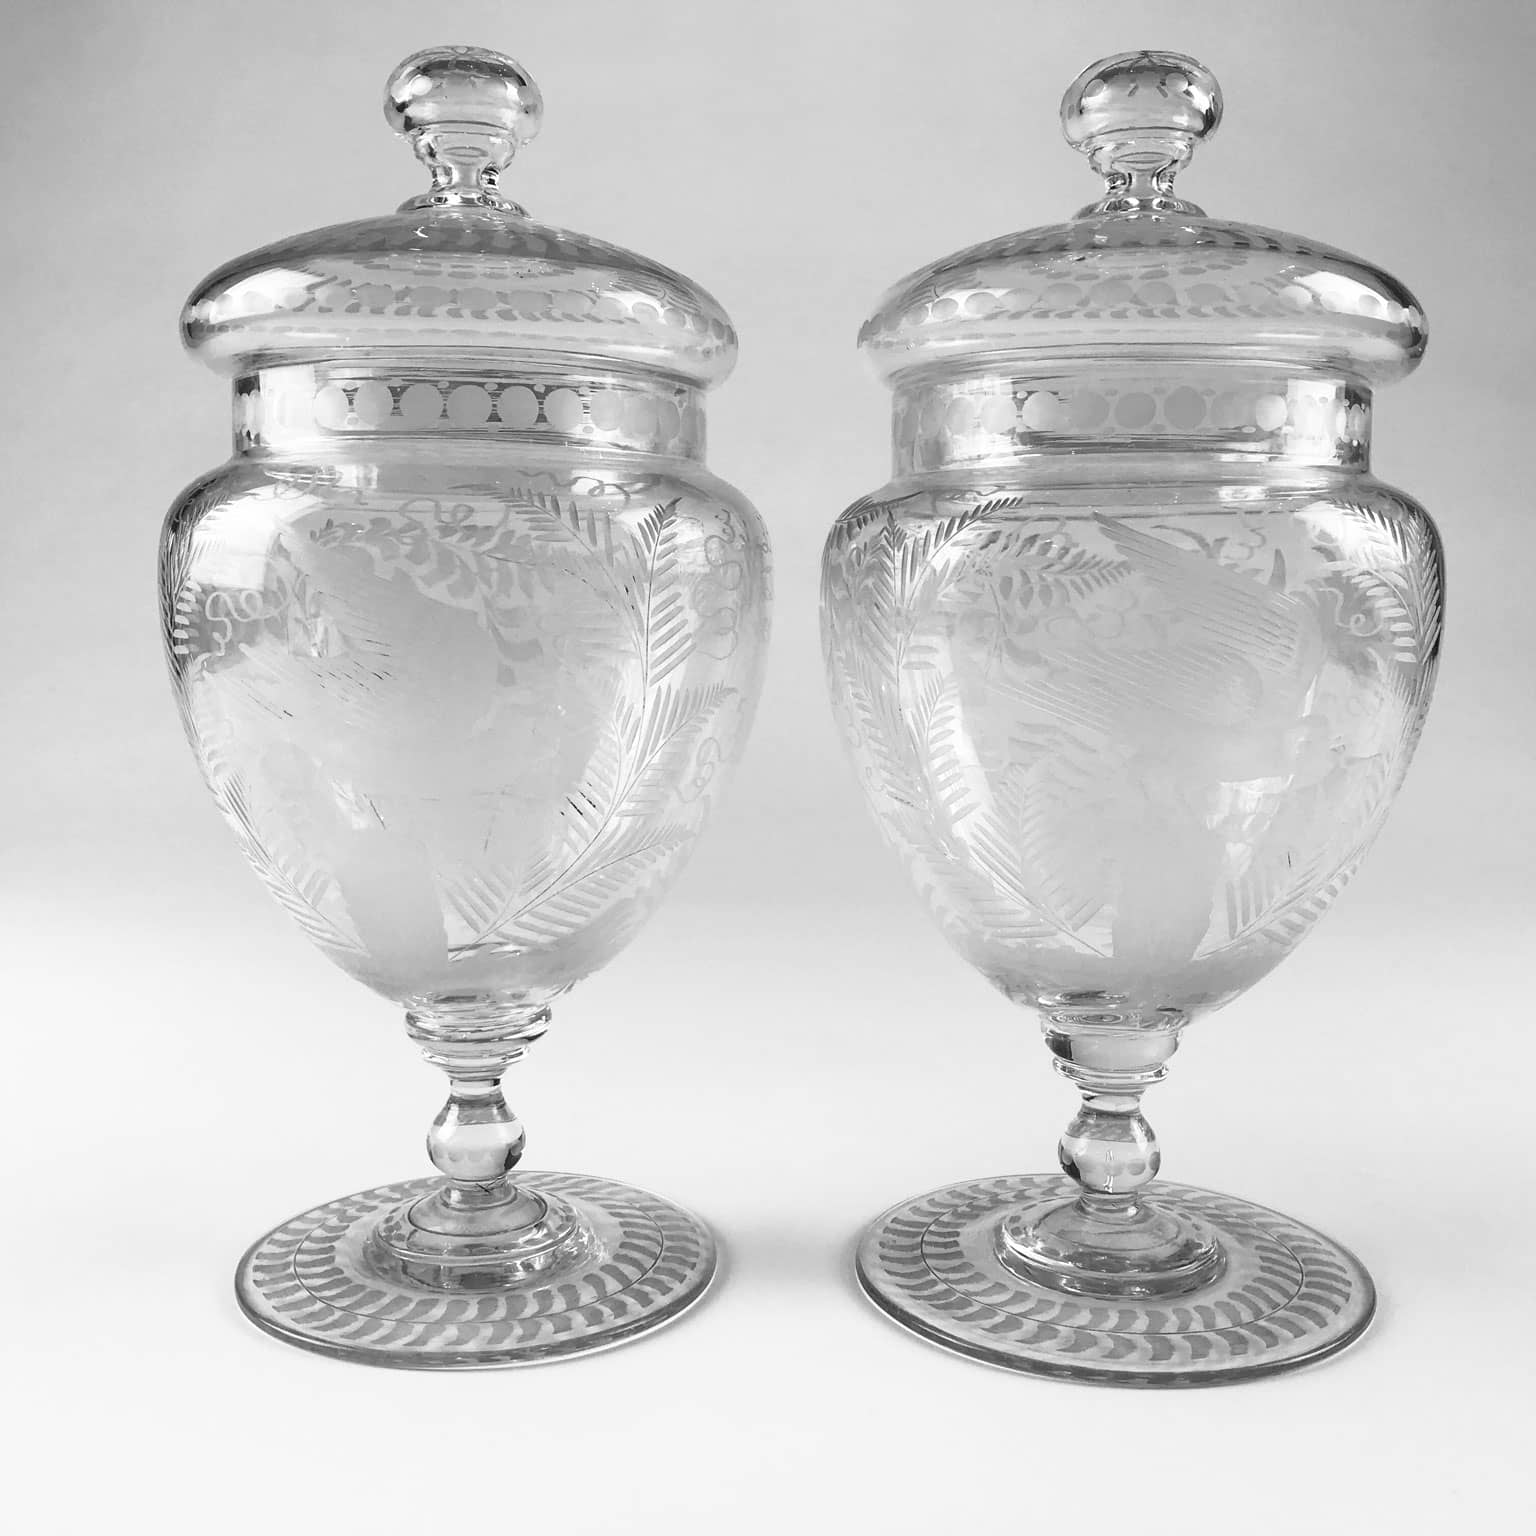 Splendida coppia di vasi con coperchio in vetro finemente for Vasi ermetici vetro